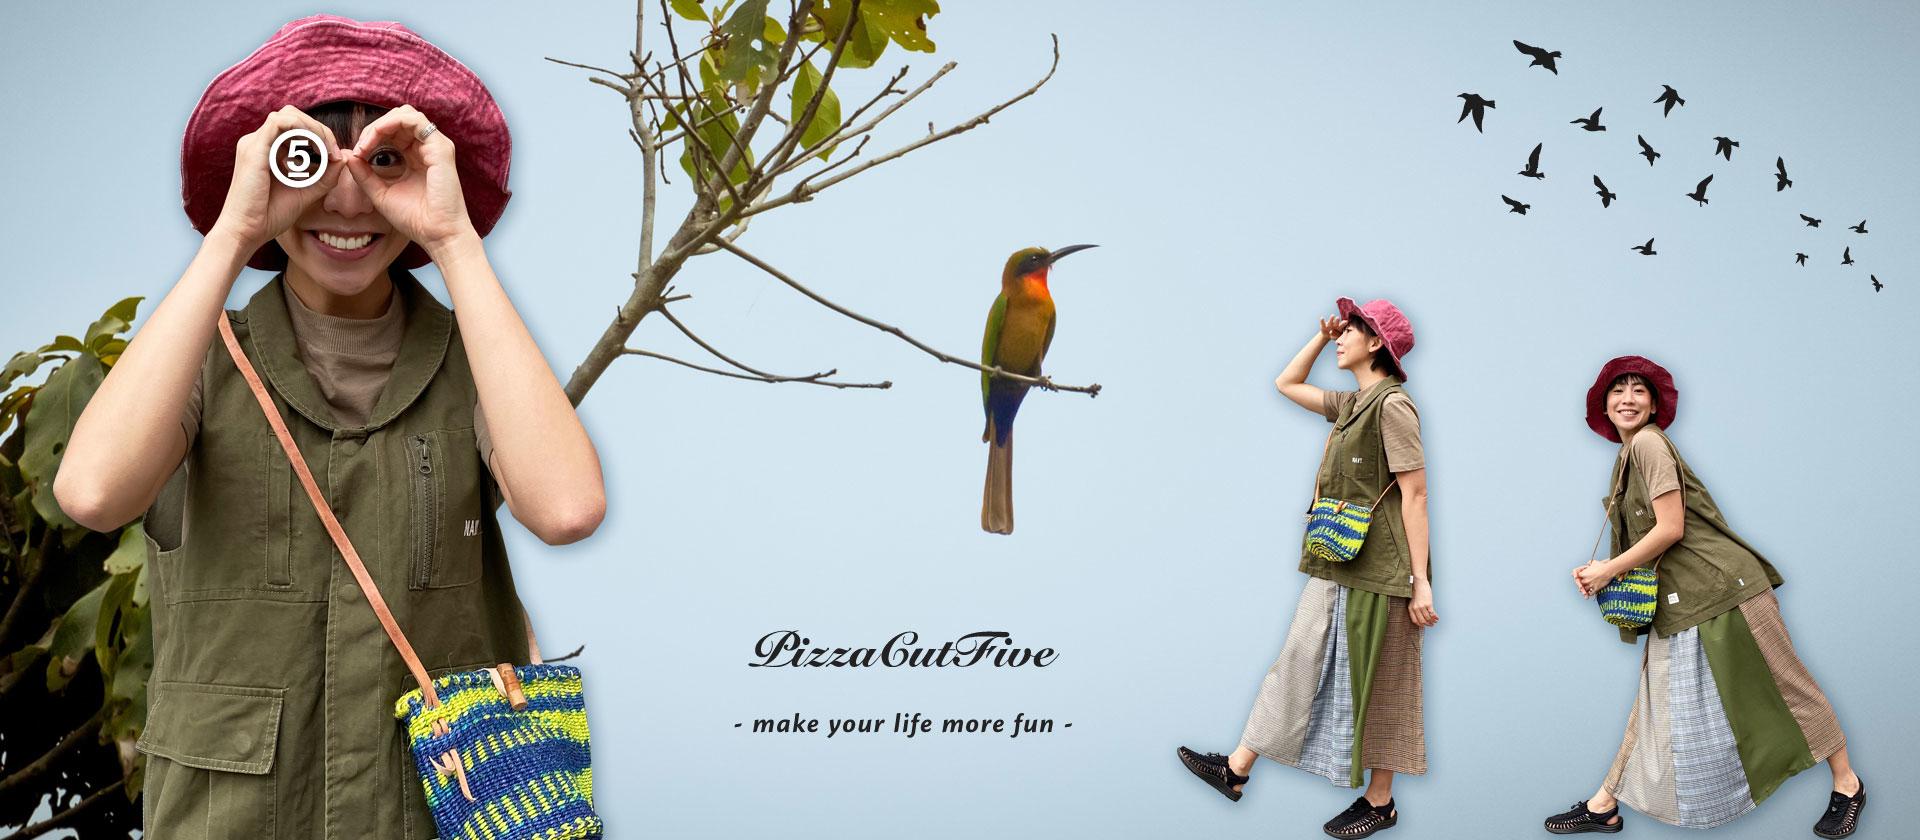 PizzaCutFive